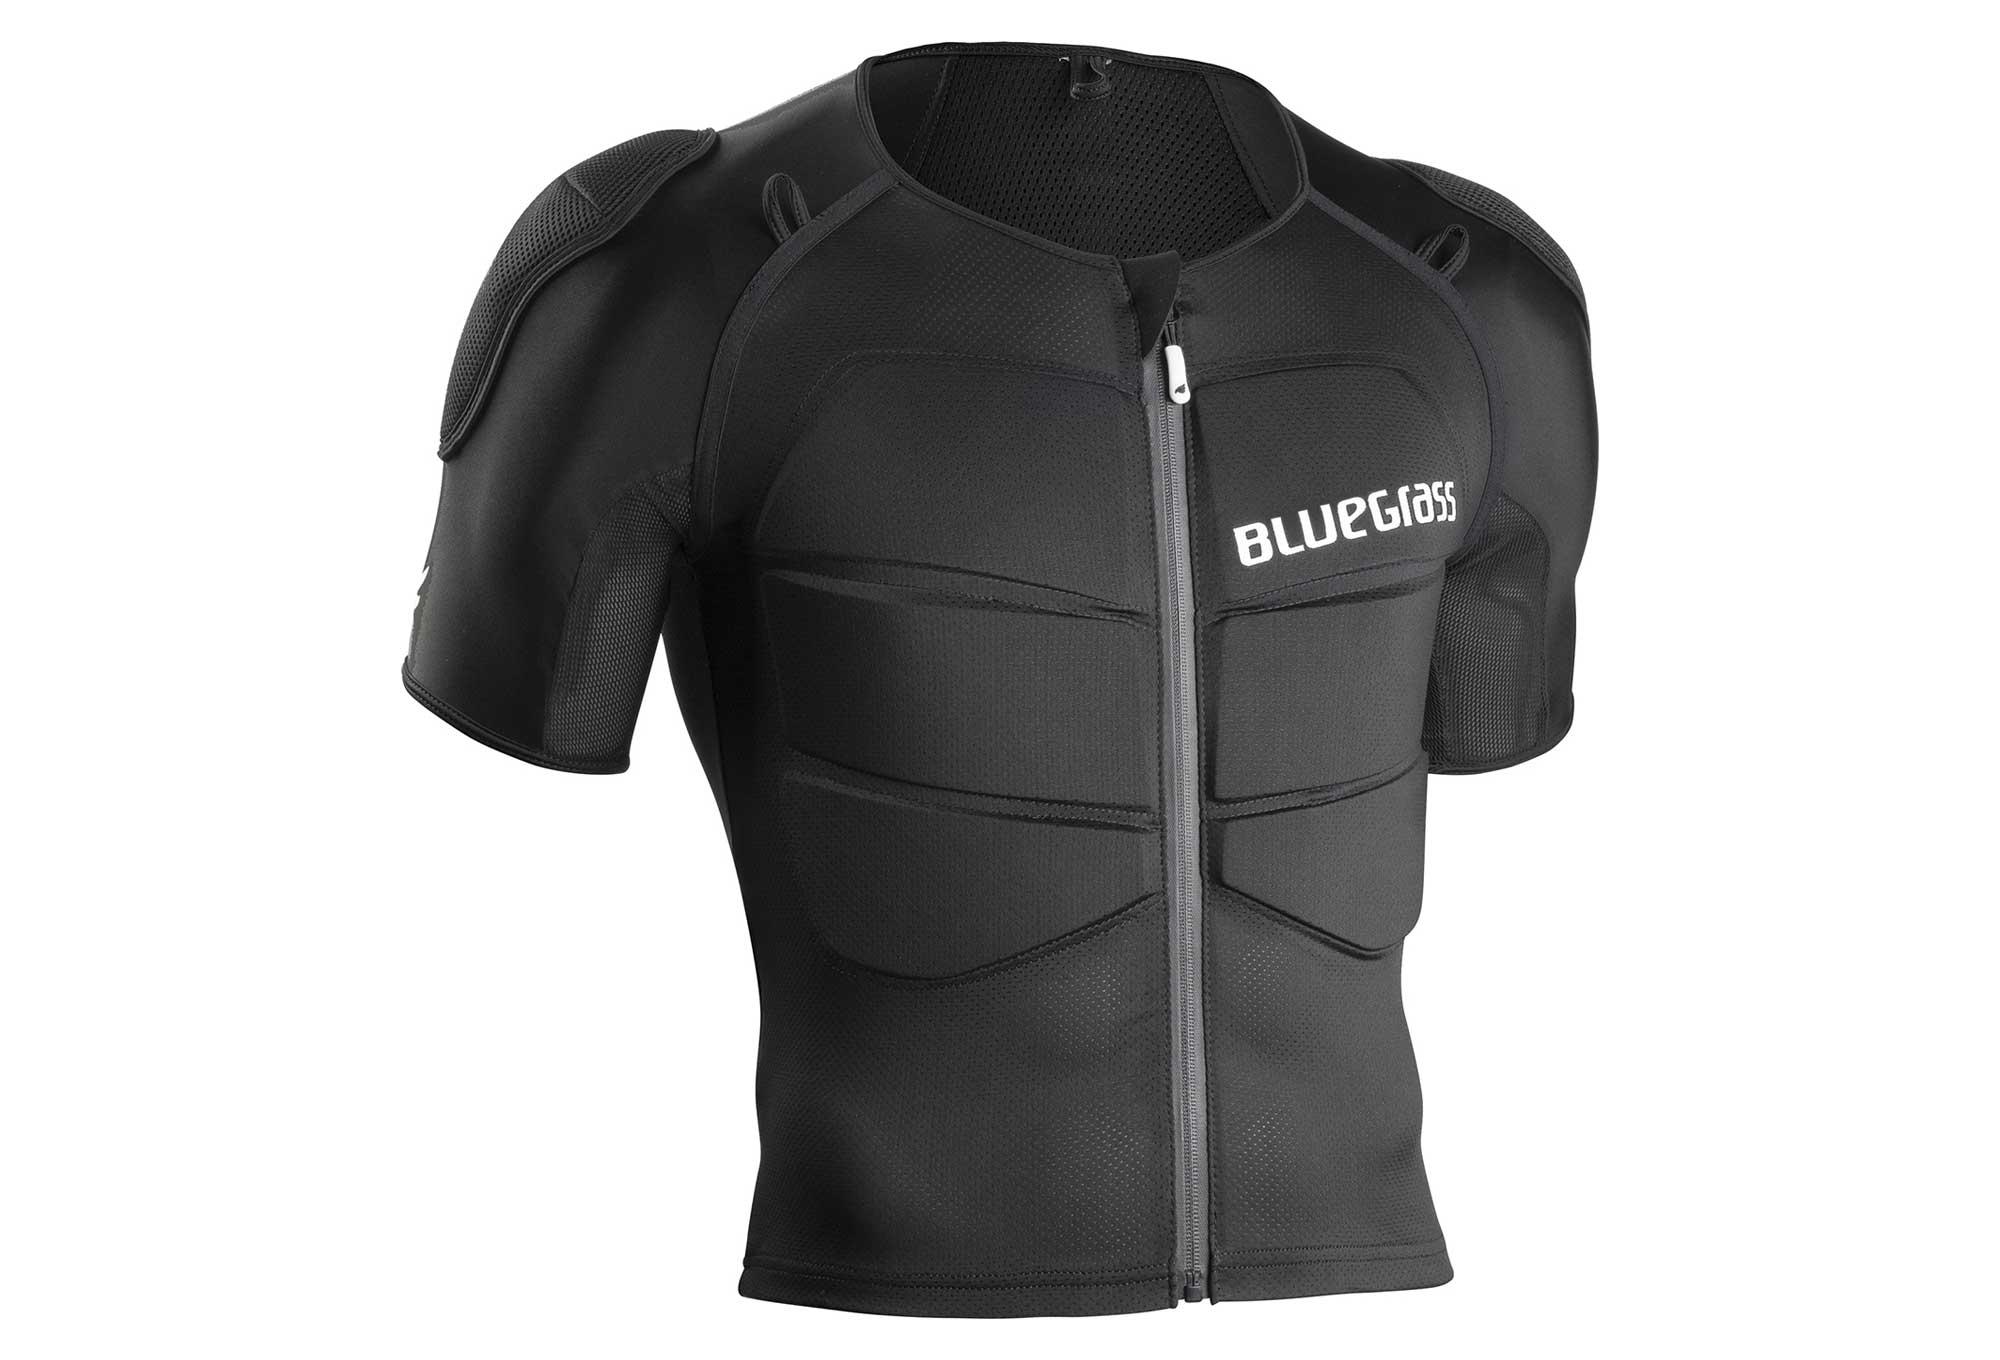 Bluegrass Armour B/&S Protektoren Jacke Trinksystem Rücken Schulter Oberkörper